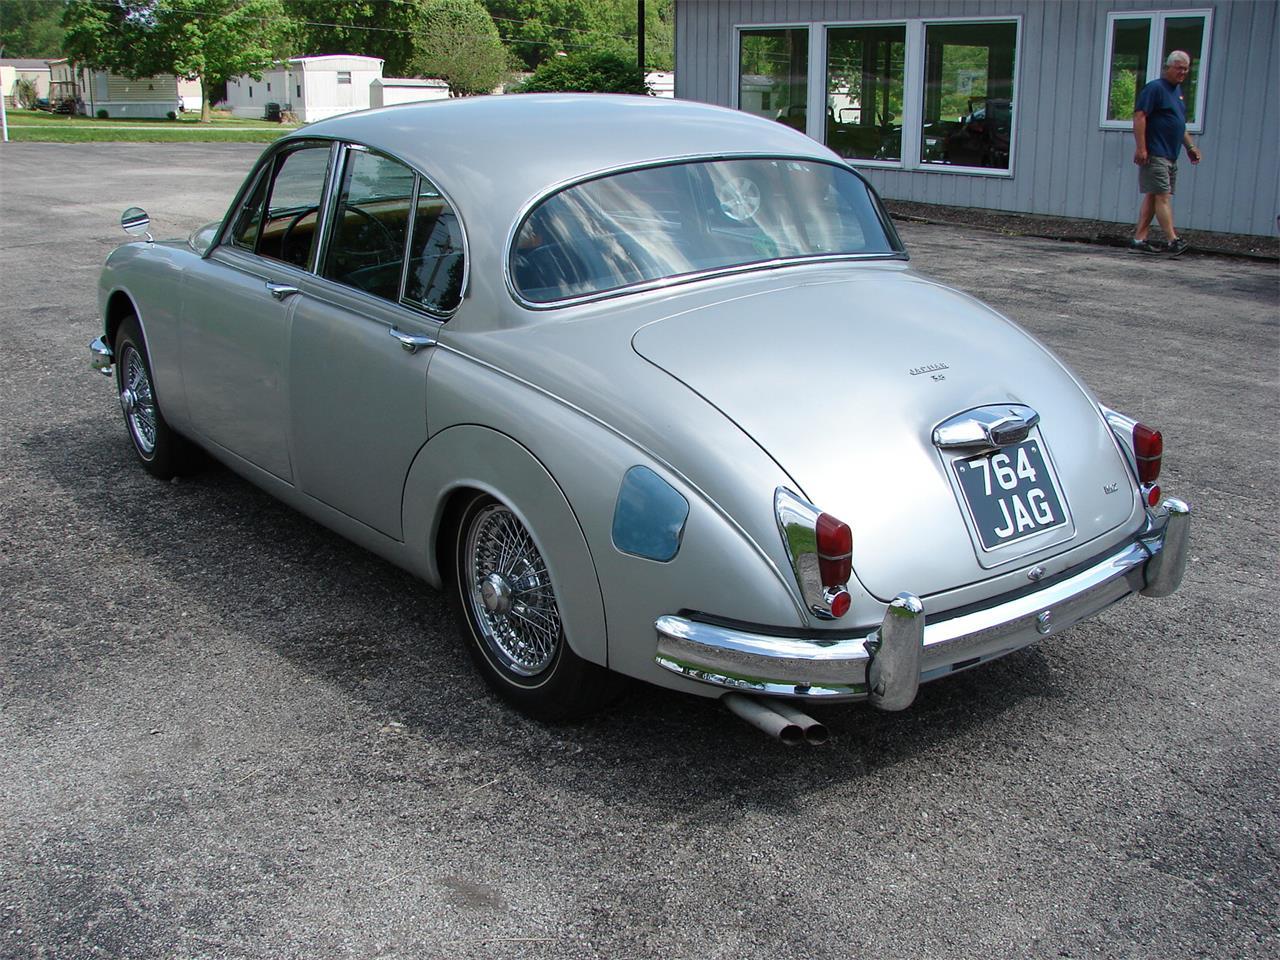 1966 Jaguar Mark II for Sale | ClassicCars.com | CC-1141318